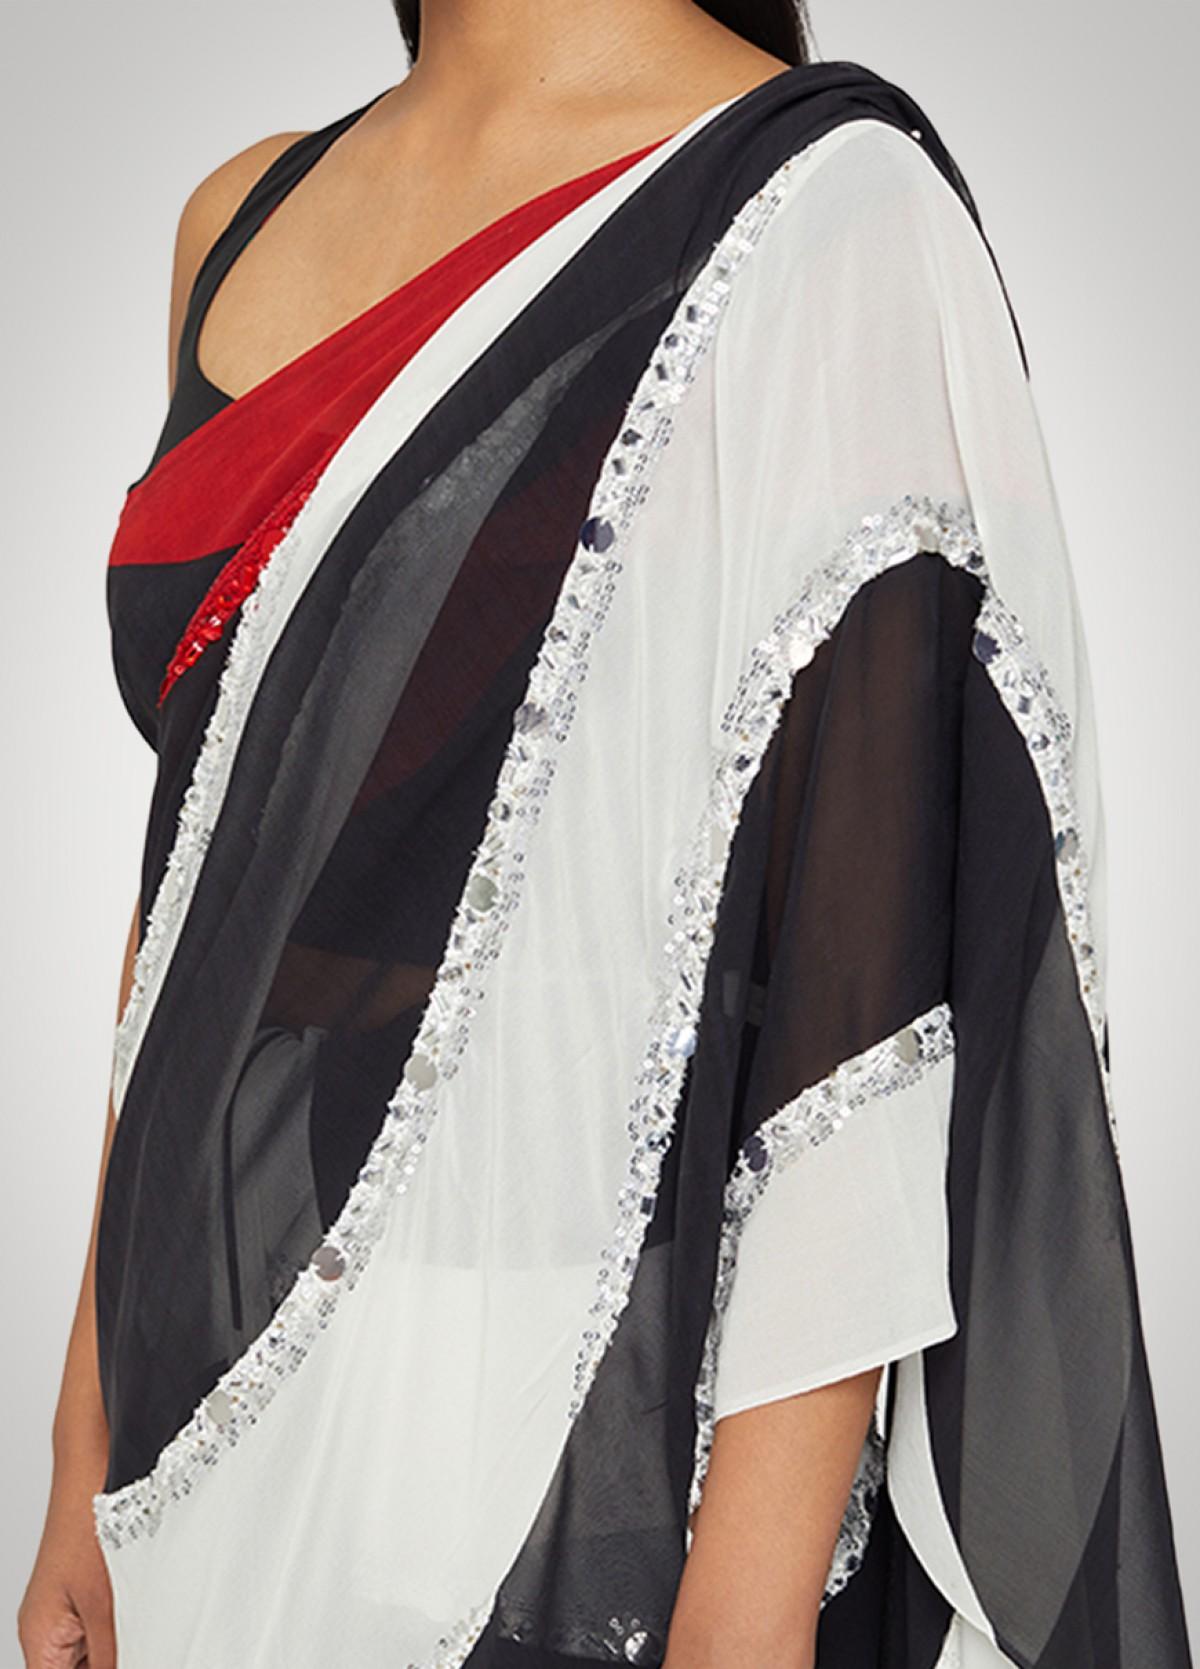 The Monochromatic Abstract Sari